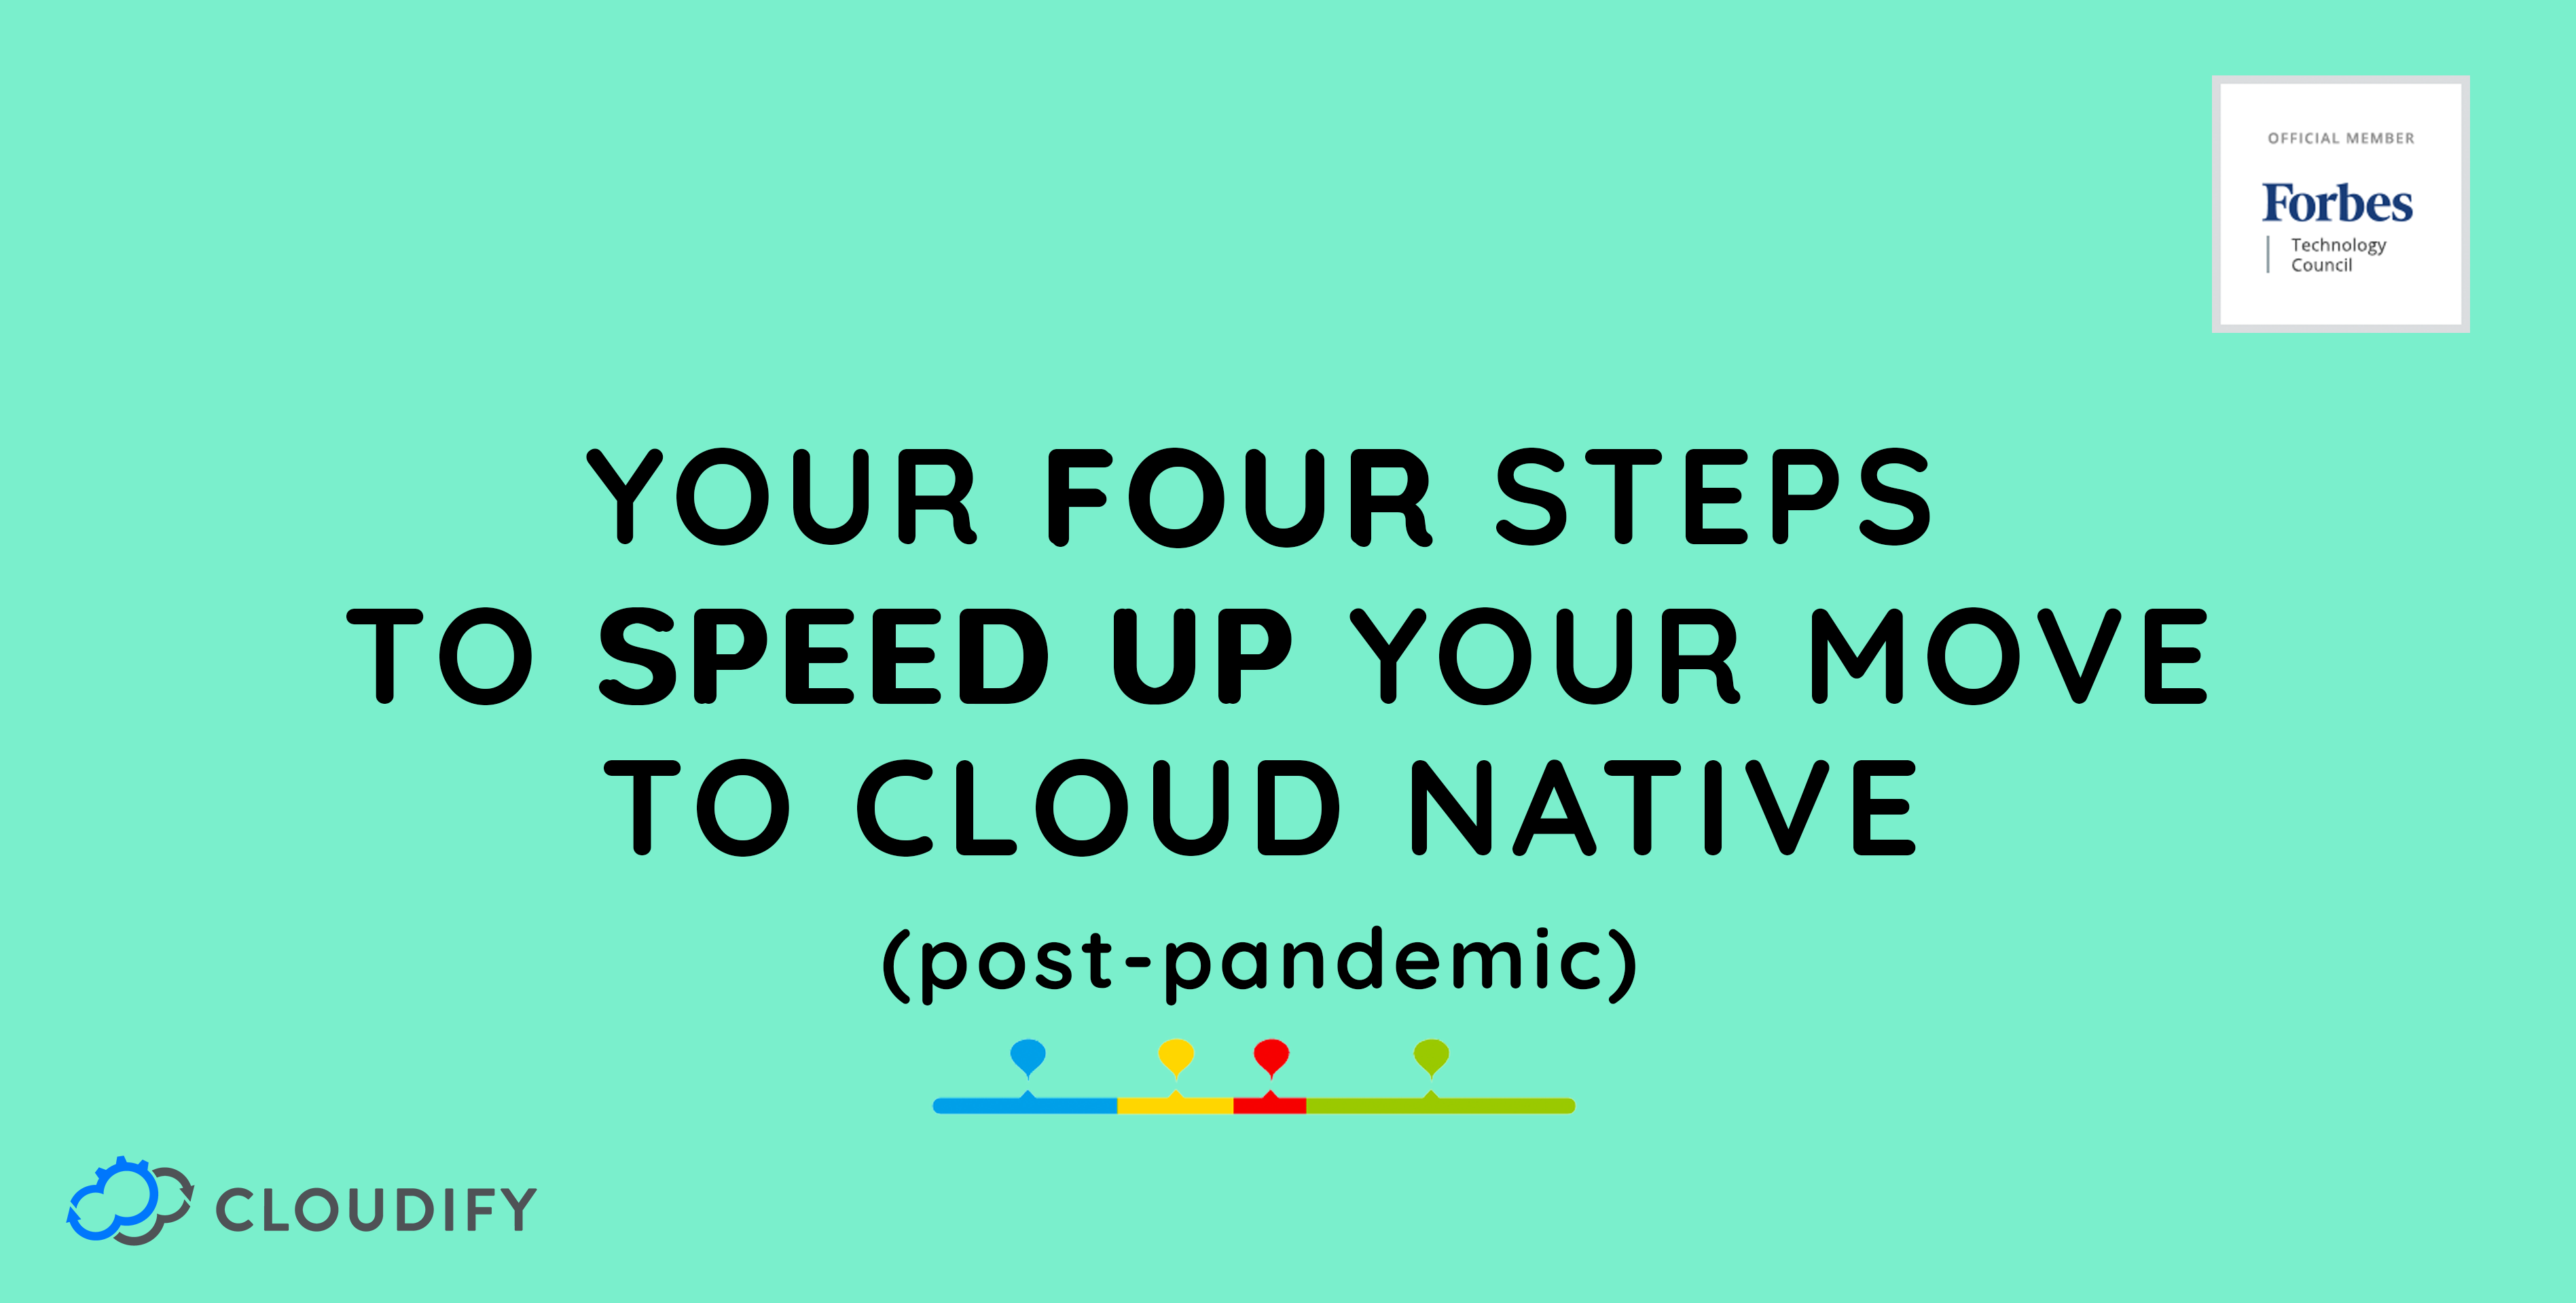 cloud native cloudify forbes